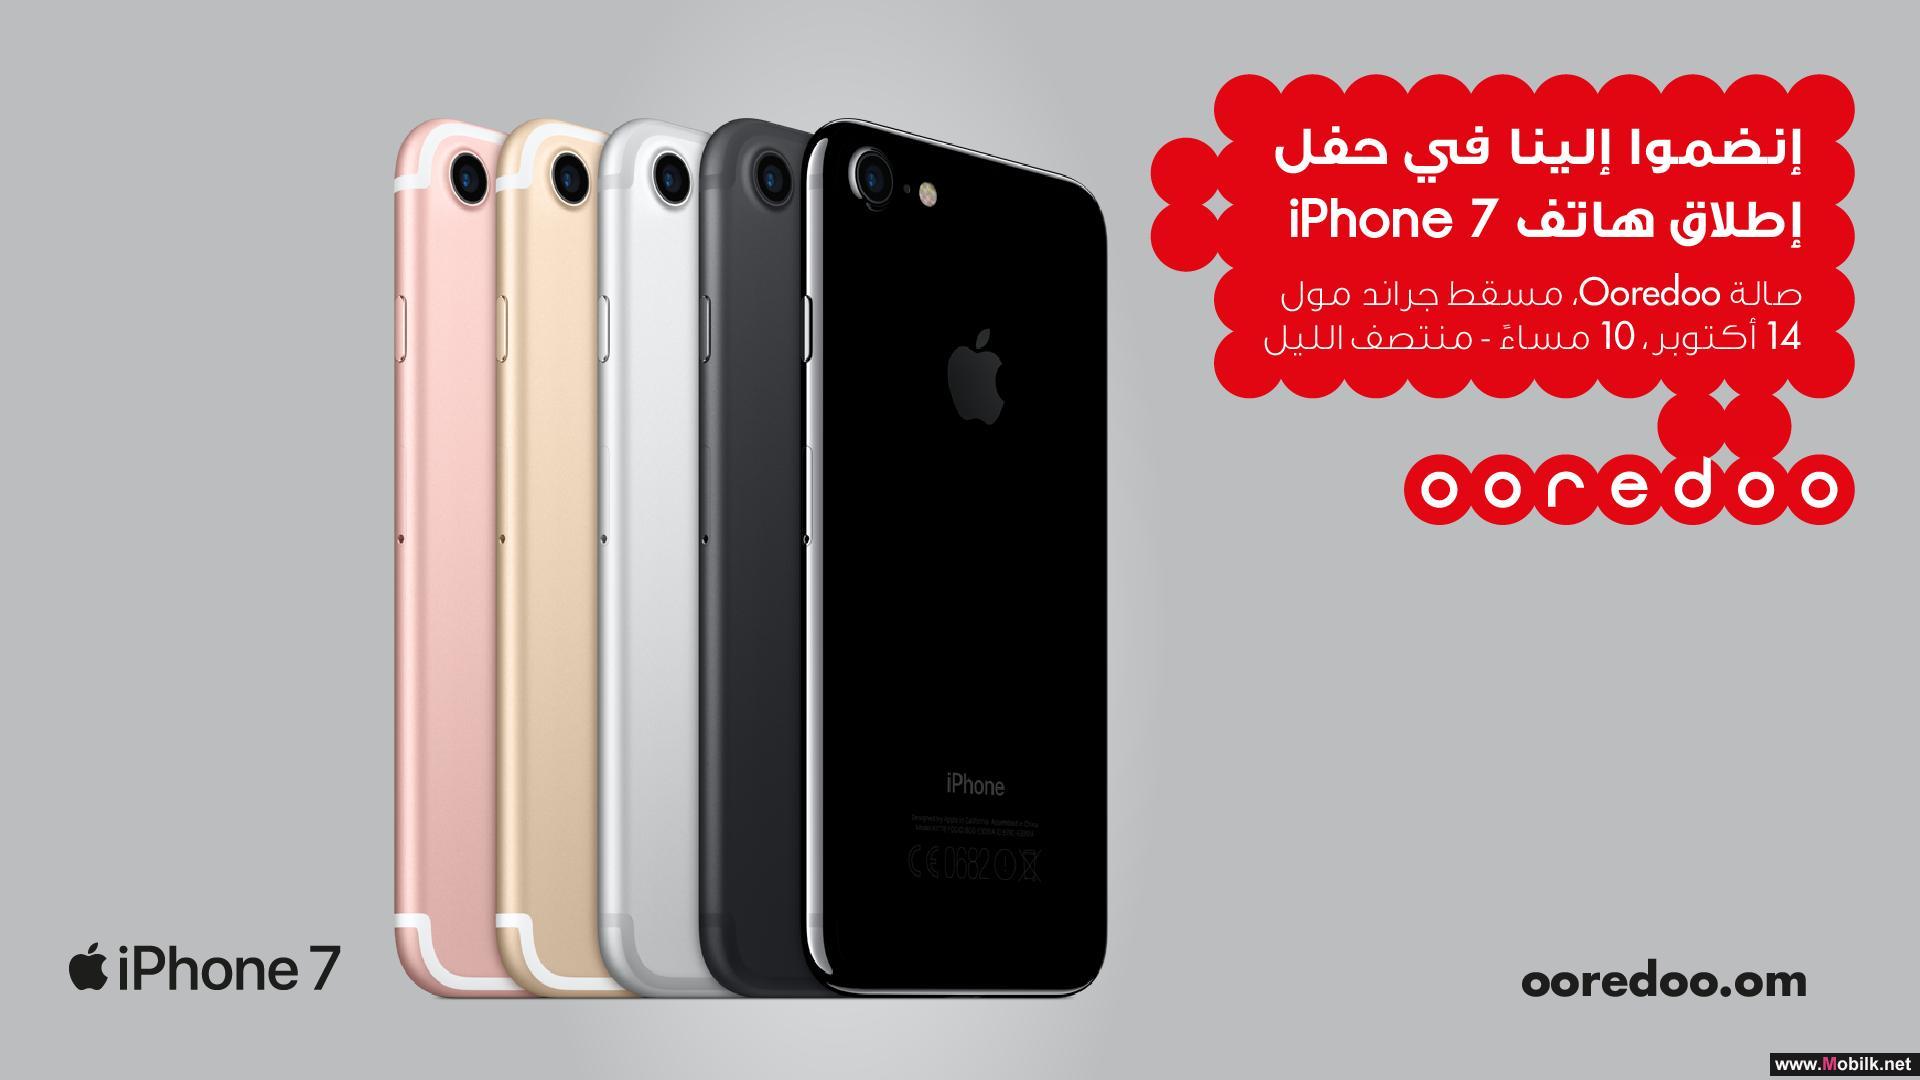 Ooredoo تطلق iPhone 7 في السلطنة خلال إحتفالية خاصة